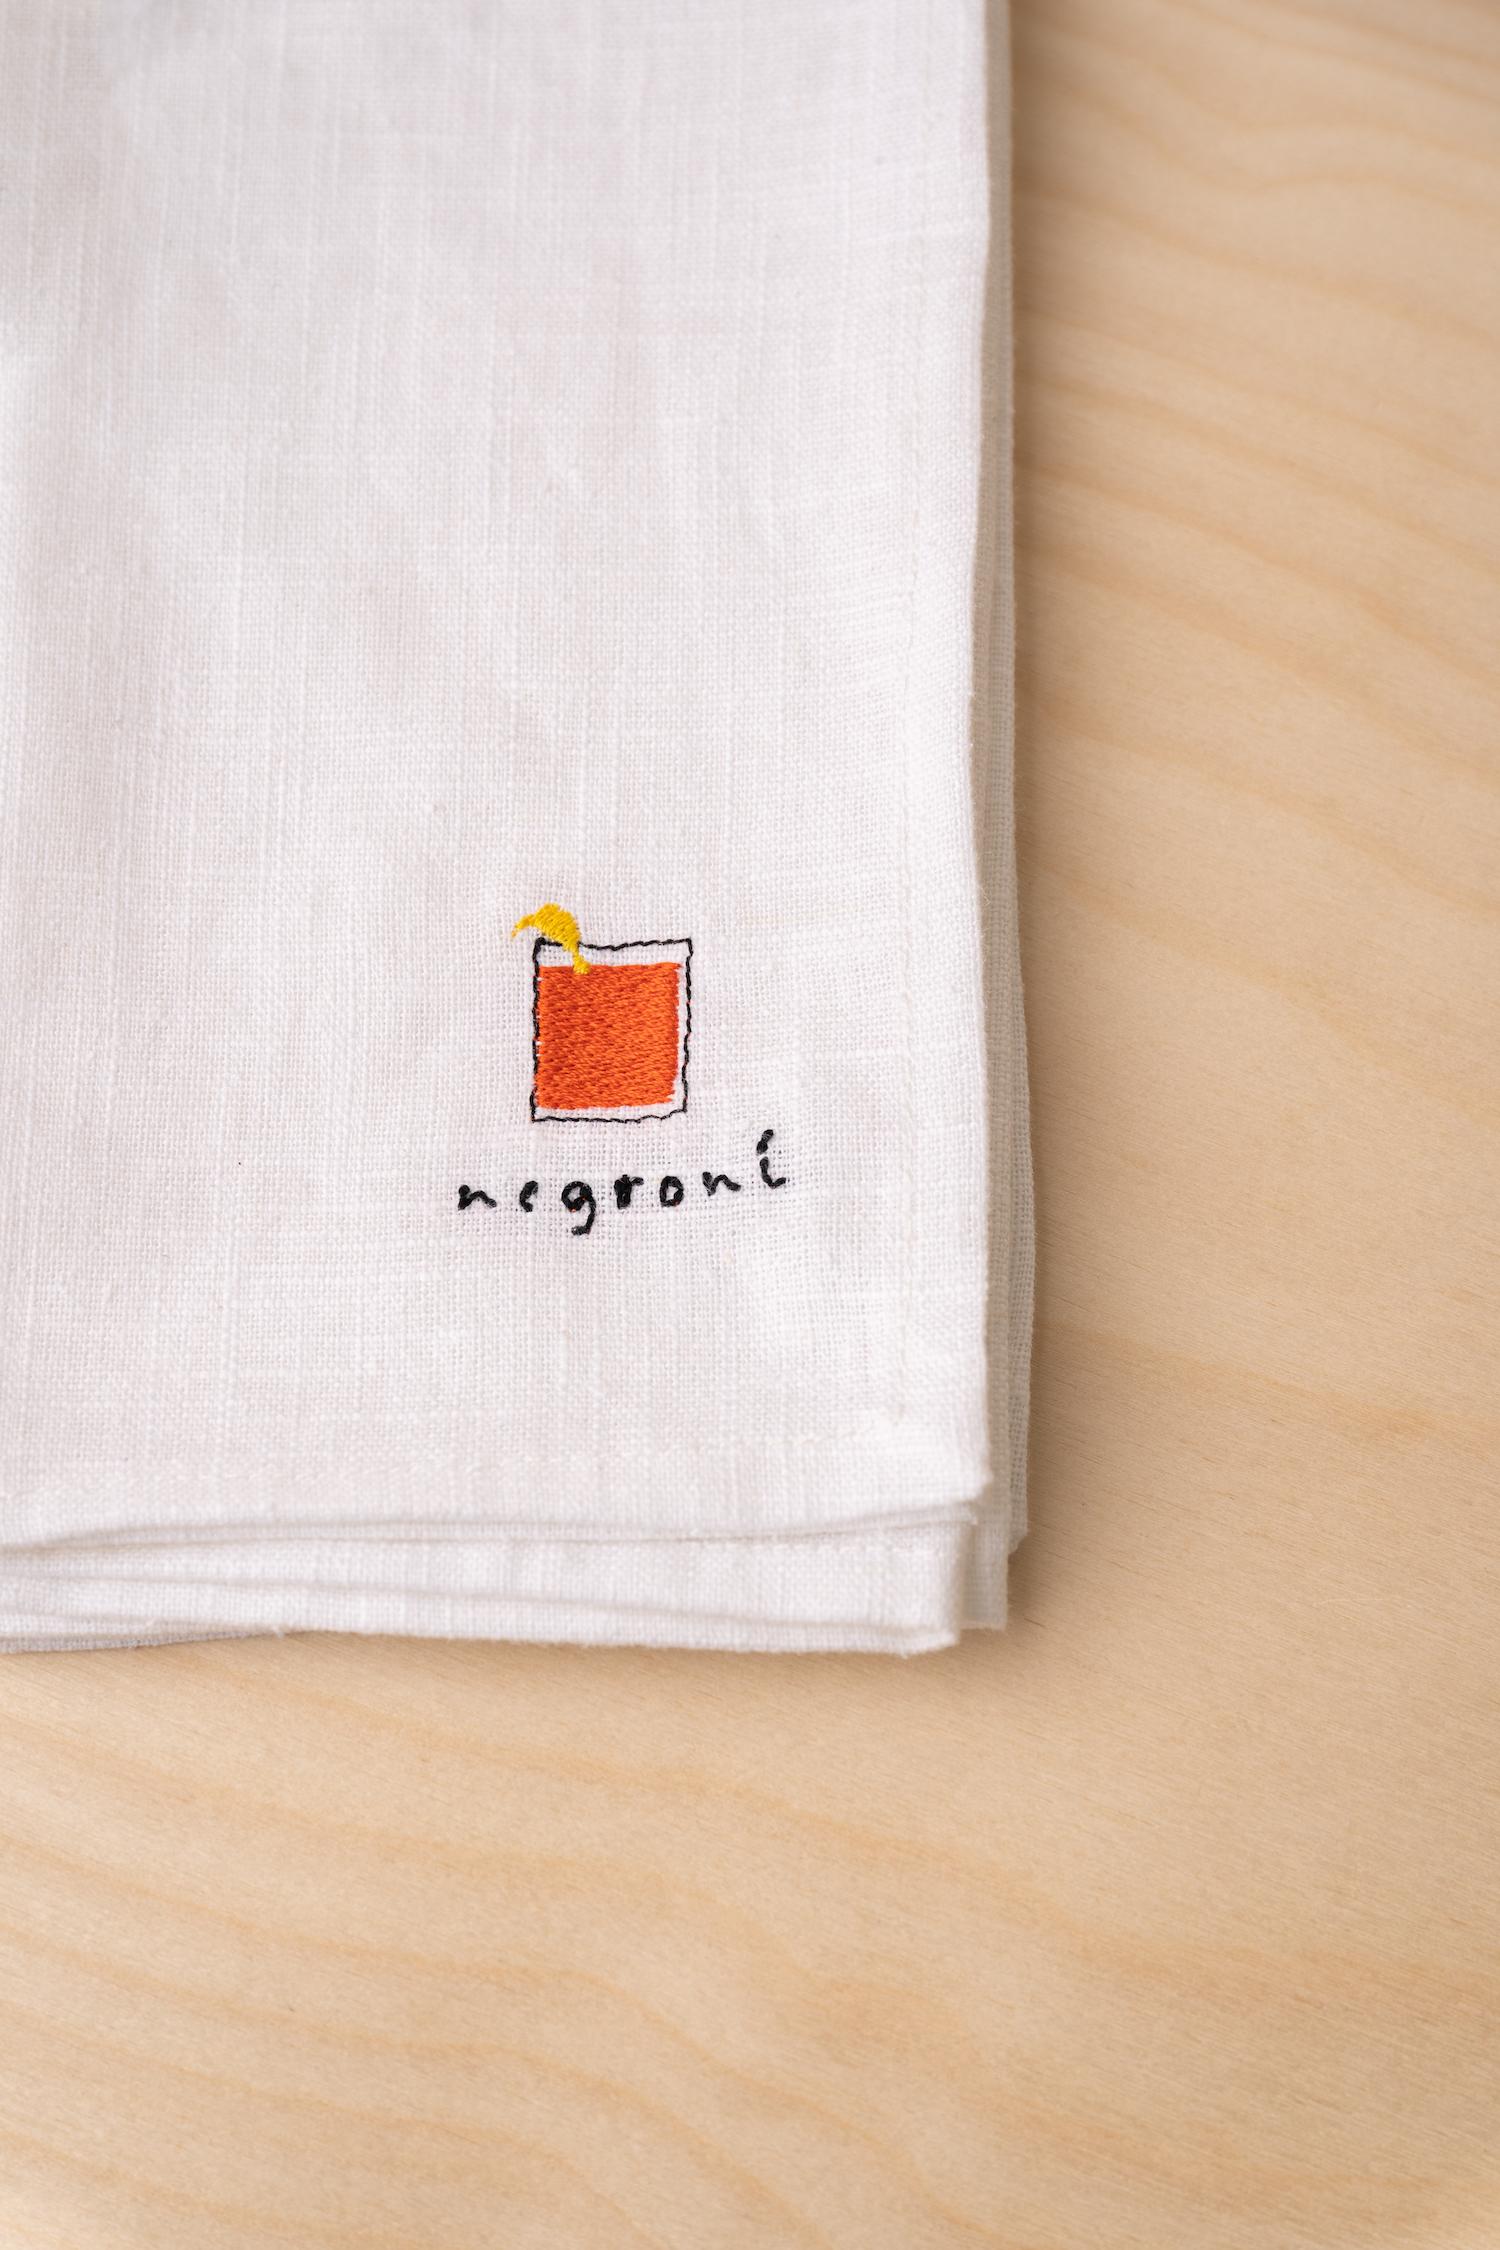 Cocktail Napkins - 100% Linen - Made in Edinburgh